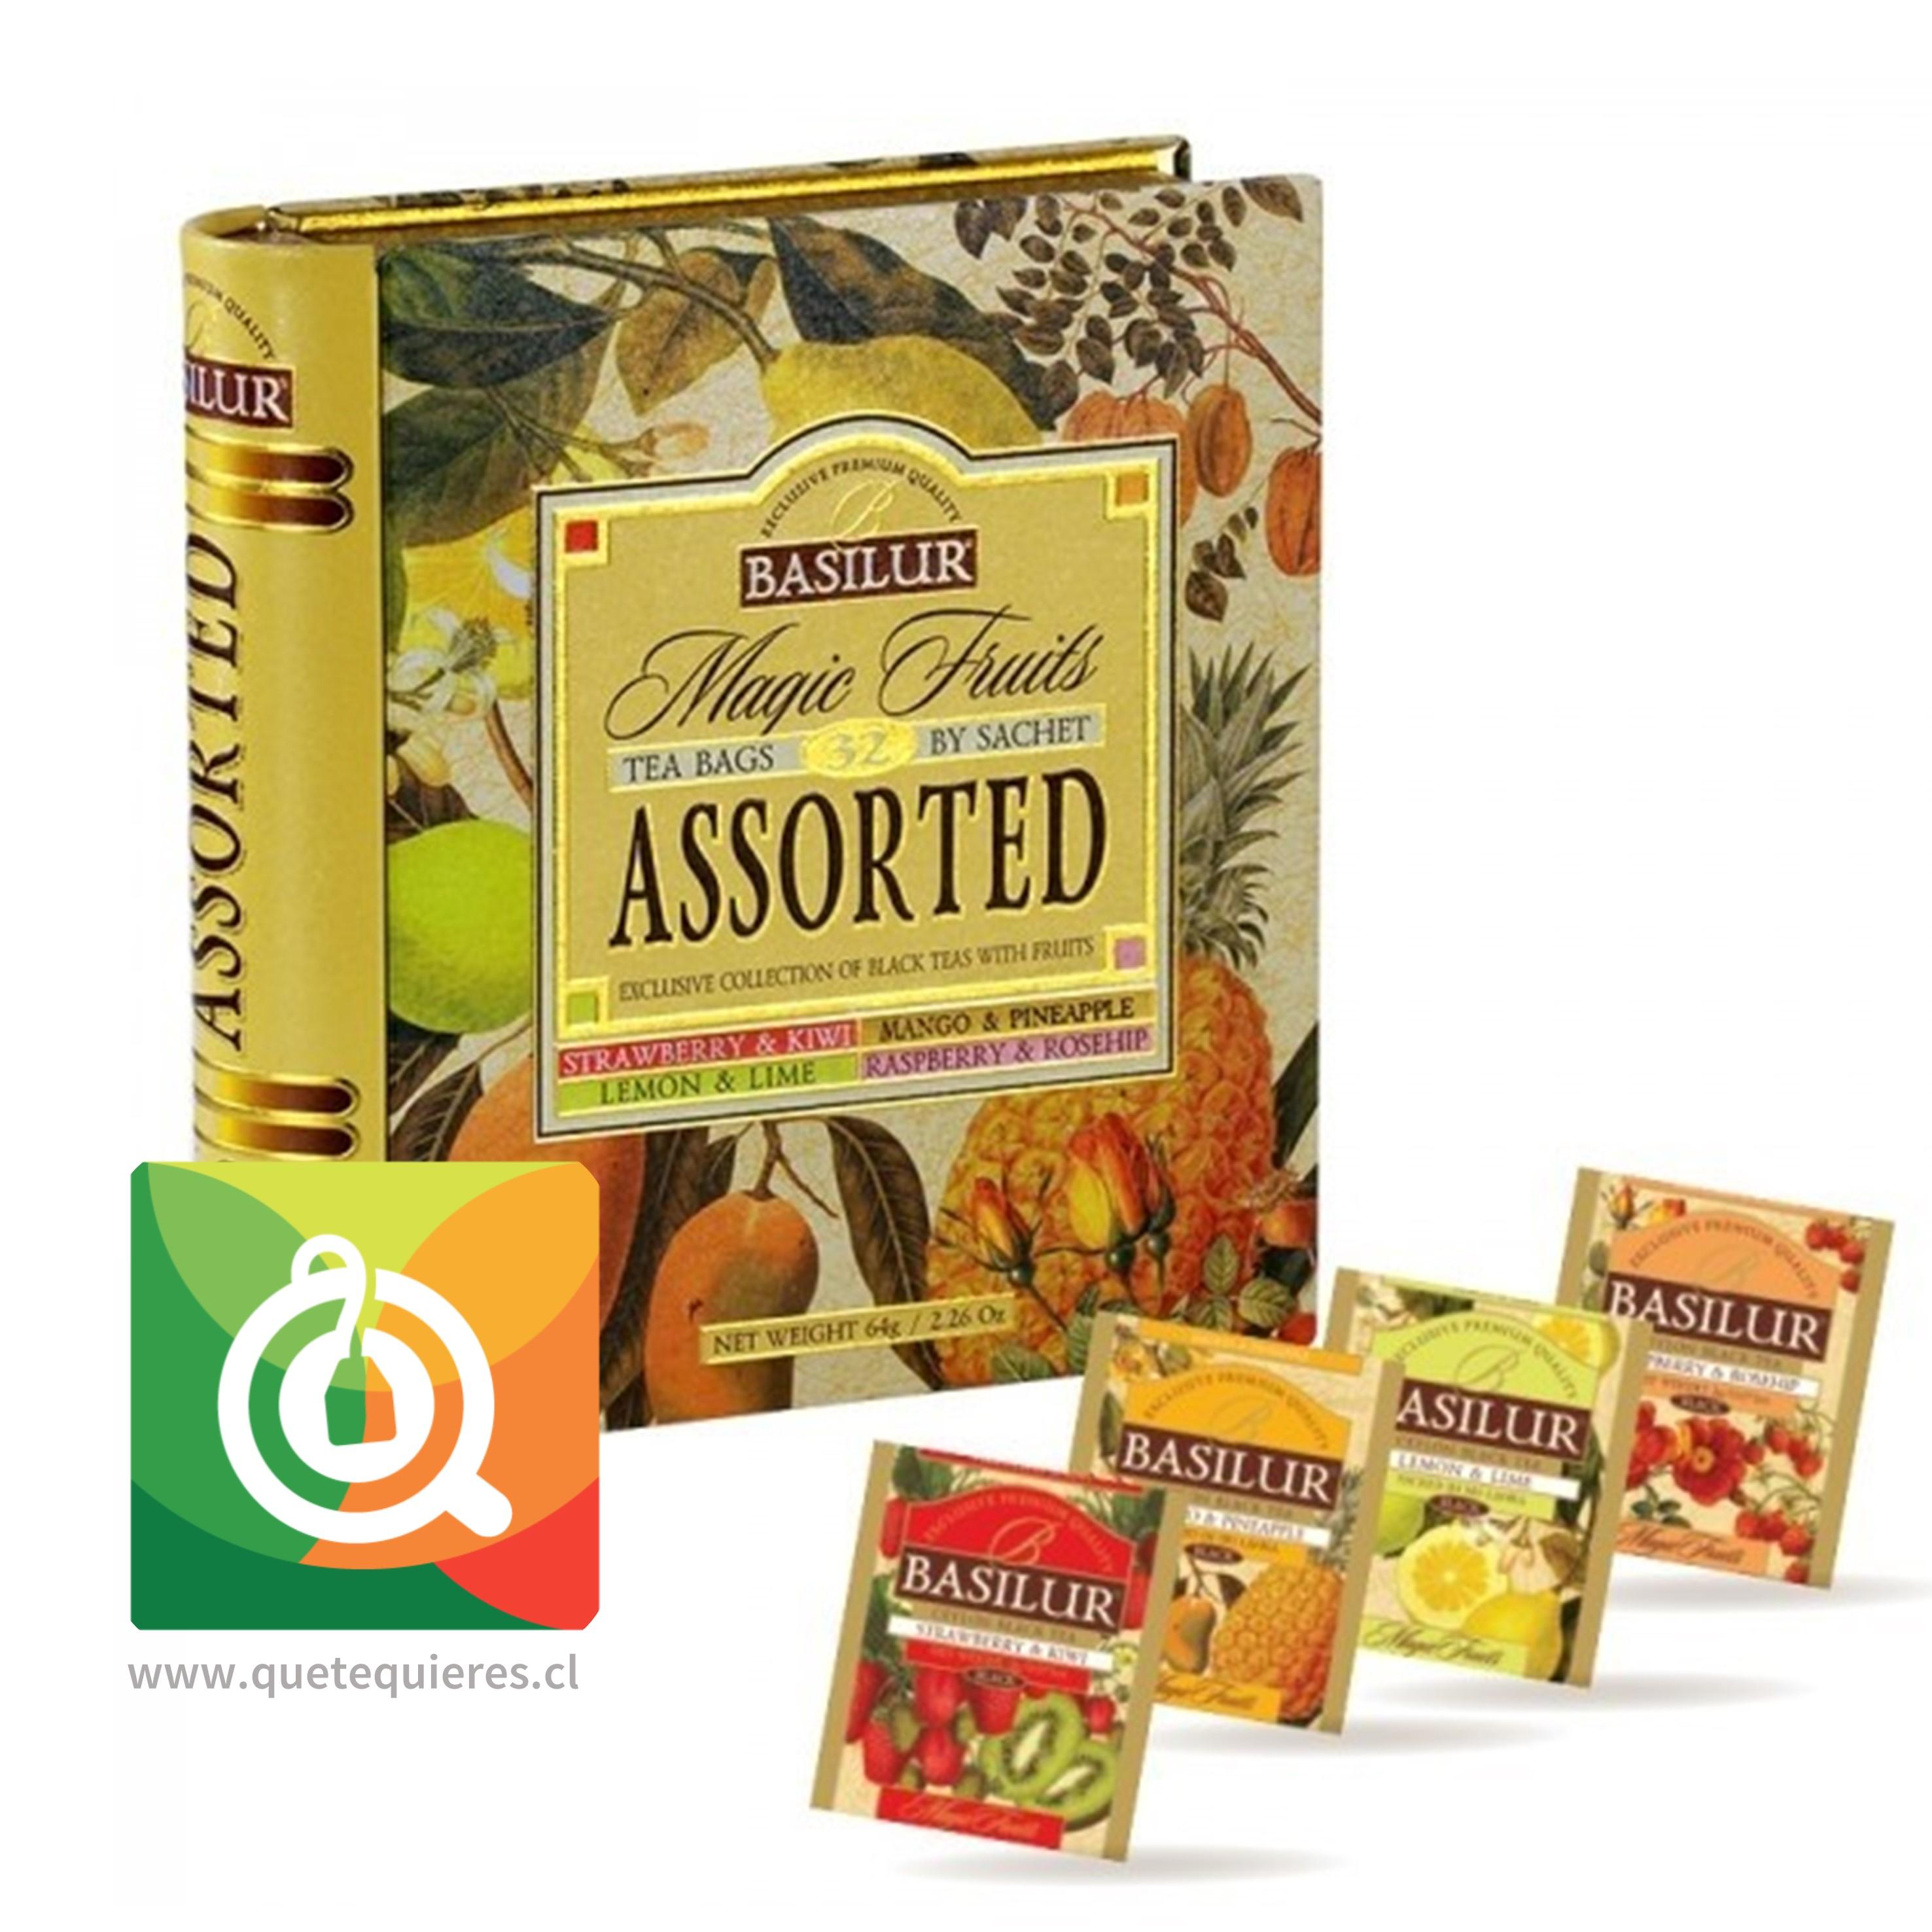 Basilur Libro Té Surtido Té Negro y Frutas - Magic Fruit Tea Book Assorted- Image 2